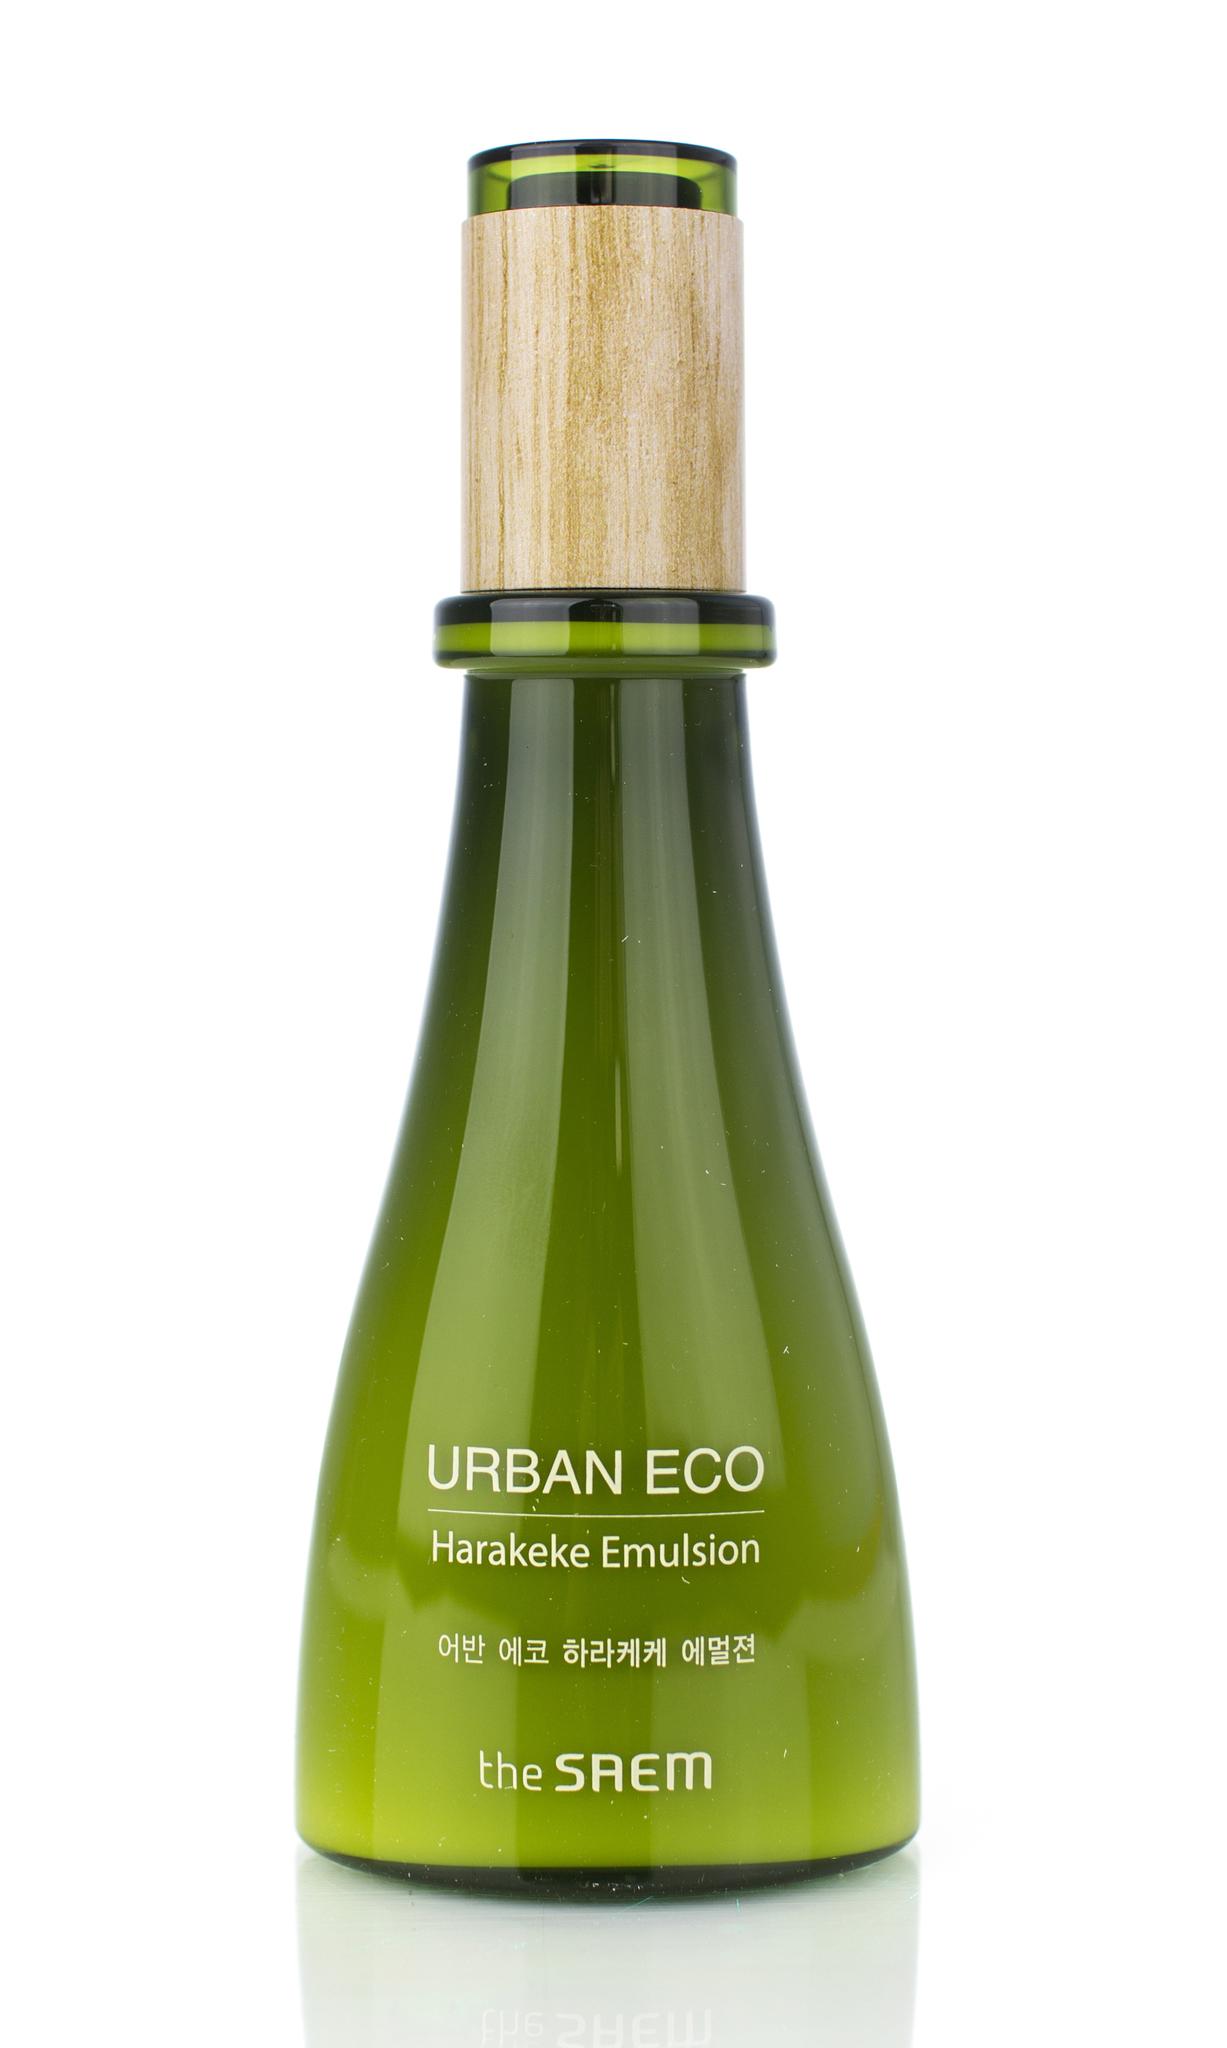 Эмульсия/ Ессенция Эмульсия для лица с экстрактом новозеландского льна Urban Eco Harakeke Emulsion 140мл the_saem_urban_eco_harakeke_emulsion.jpg